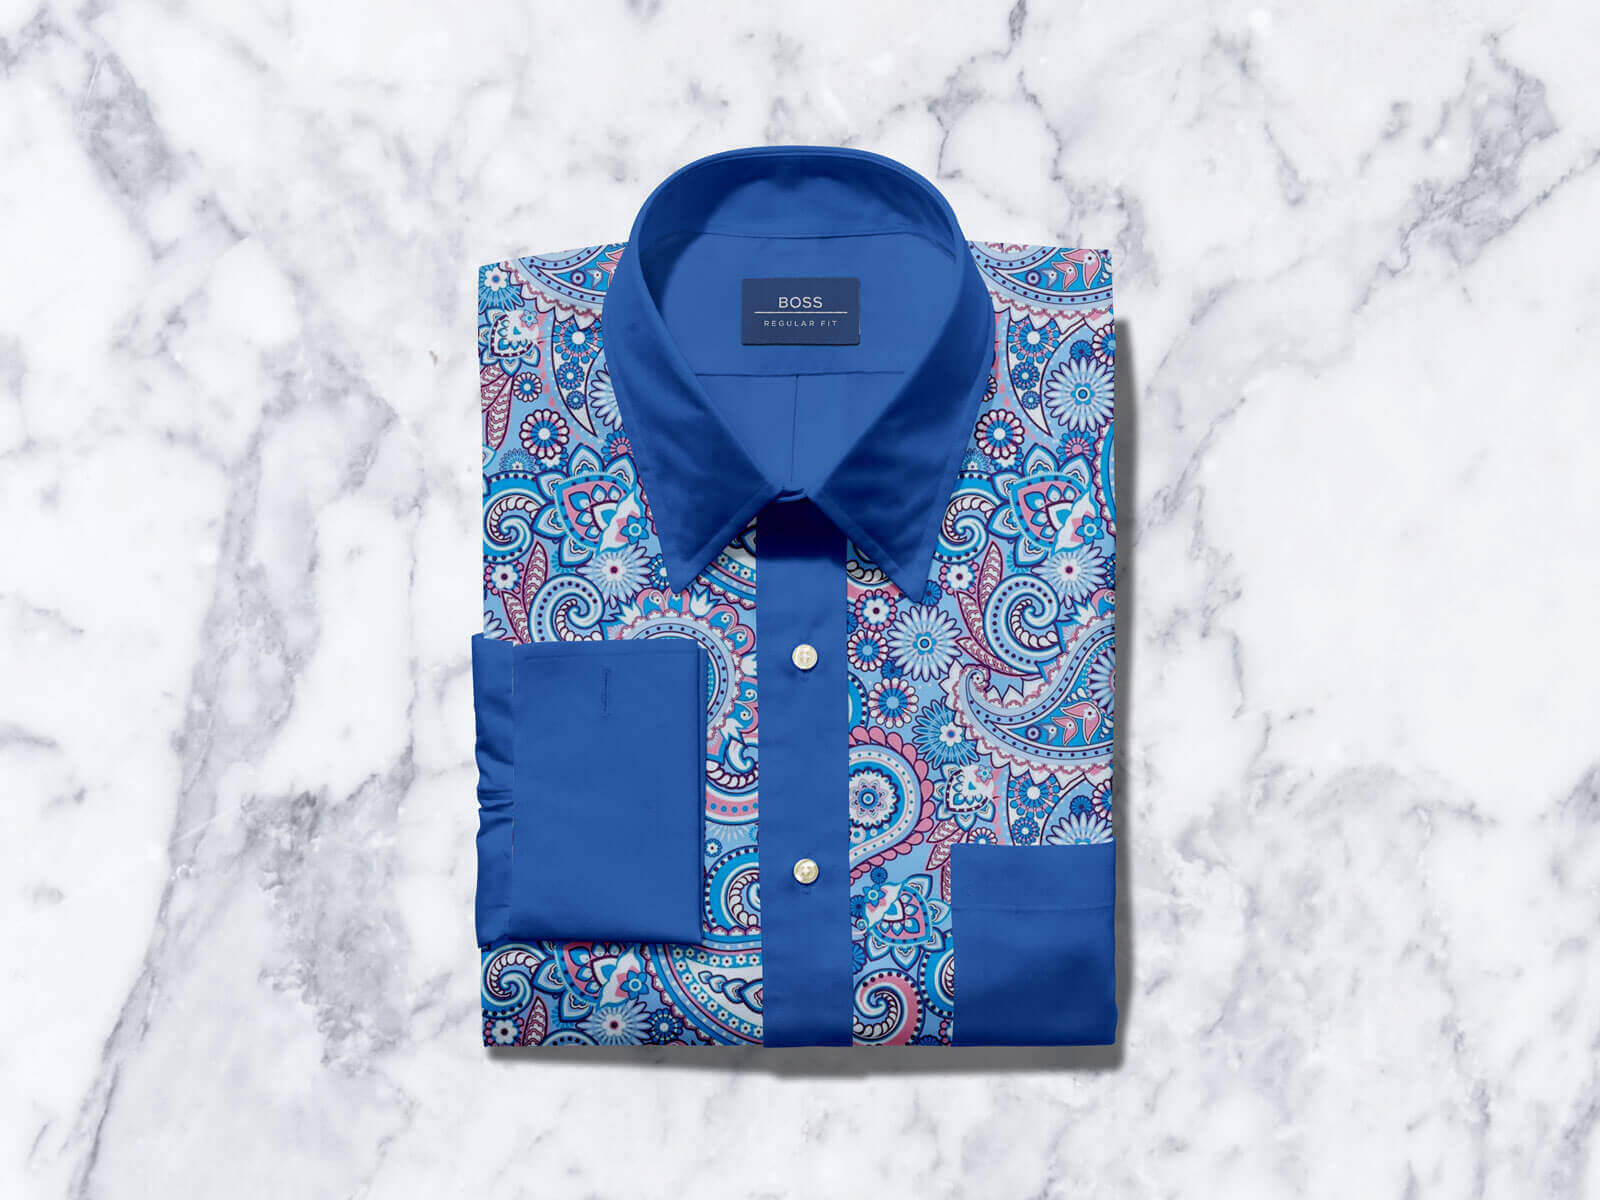 Free-Folded-Dress-Shirt-with-Label-Mockup-PSD-2